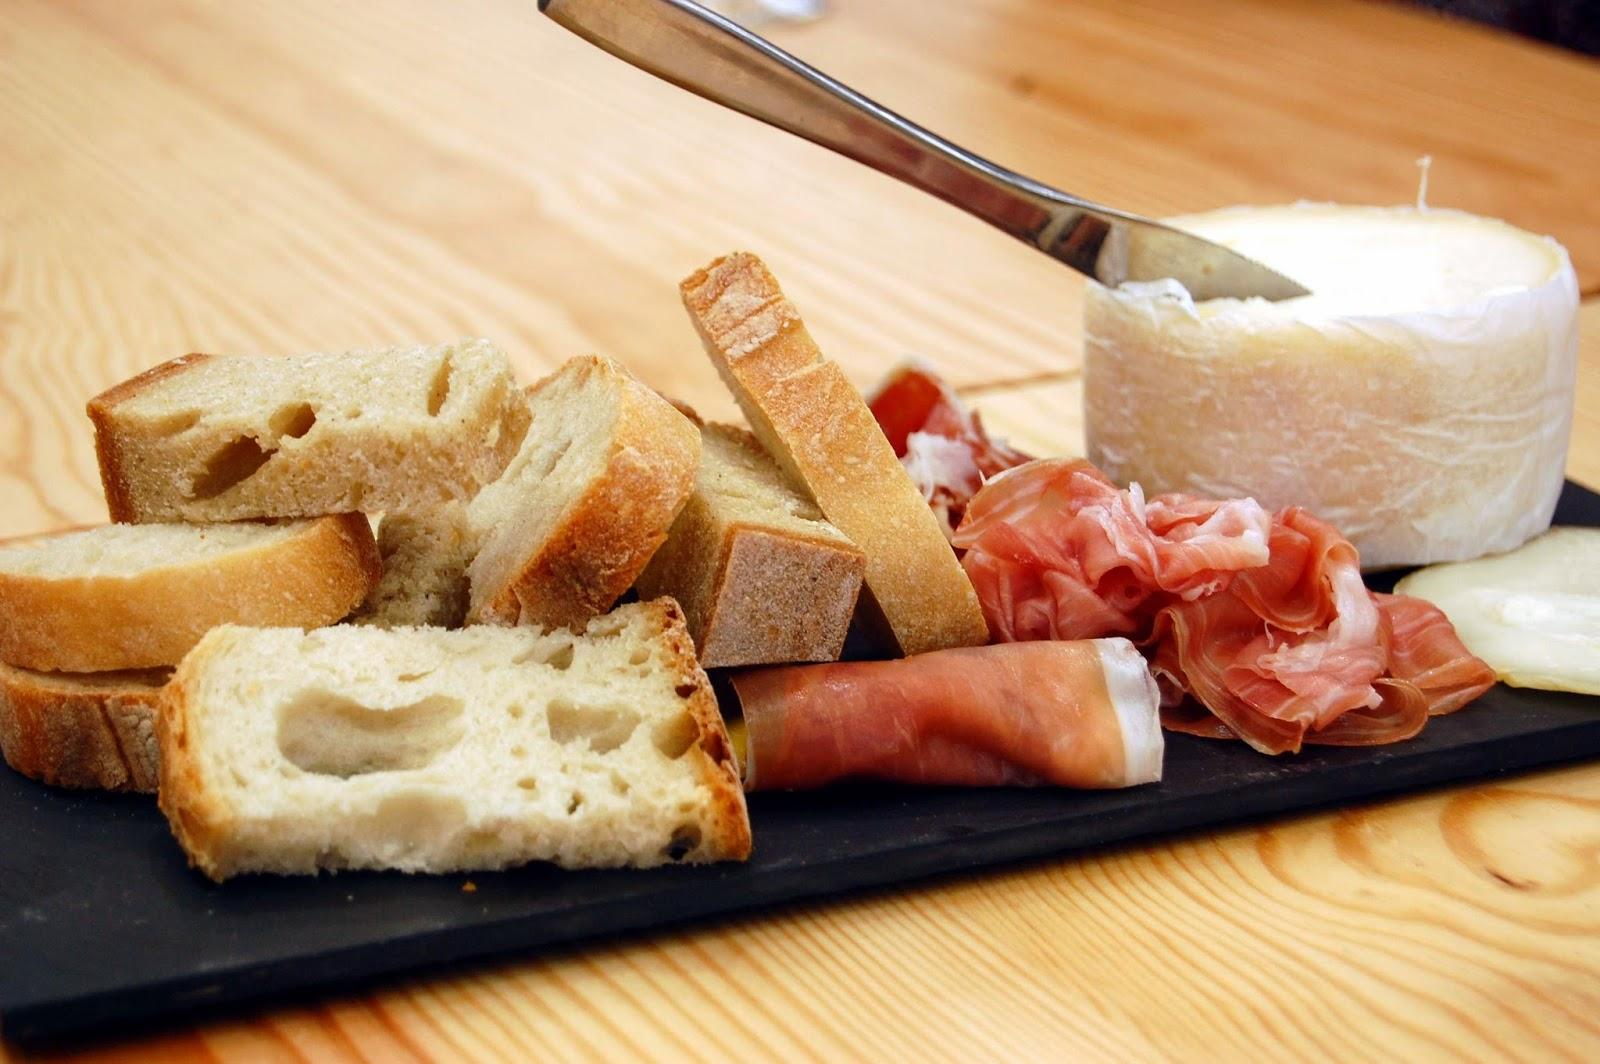 Stitch & Bear - Eat Drink Walk Petiscos Lisbon - Cheese and meat platter